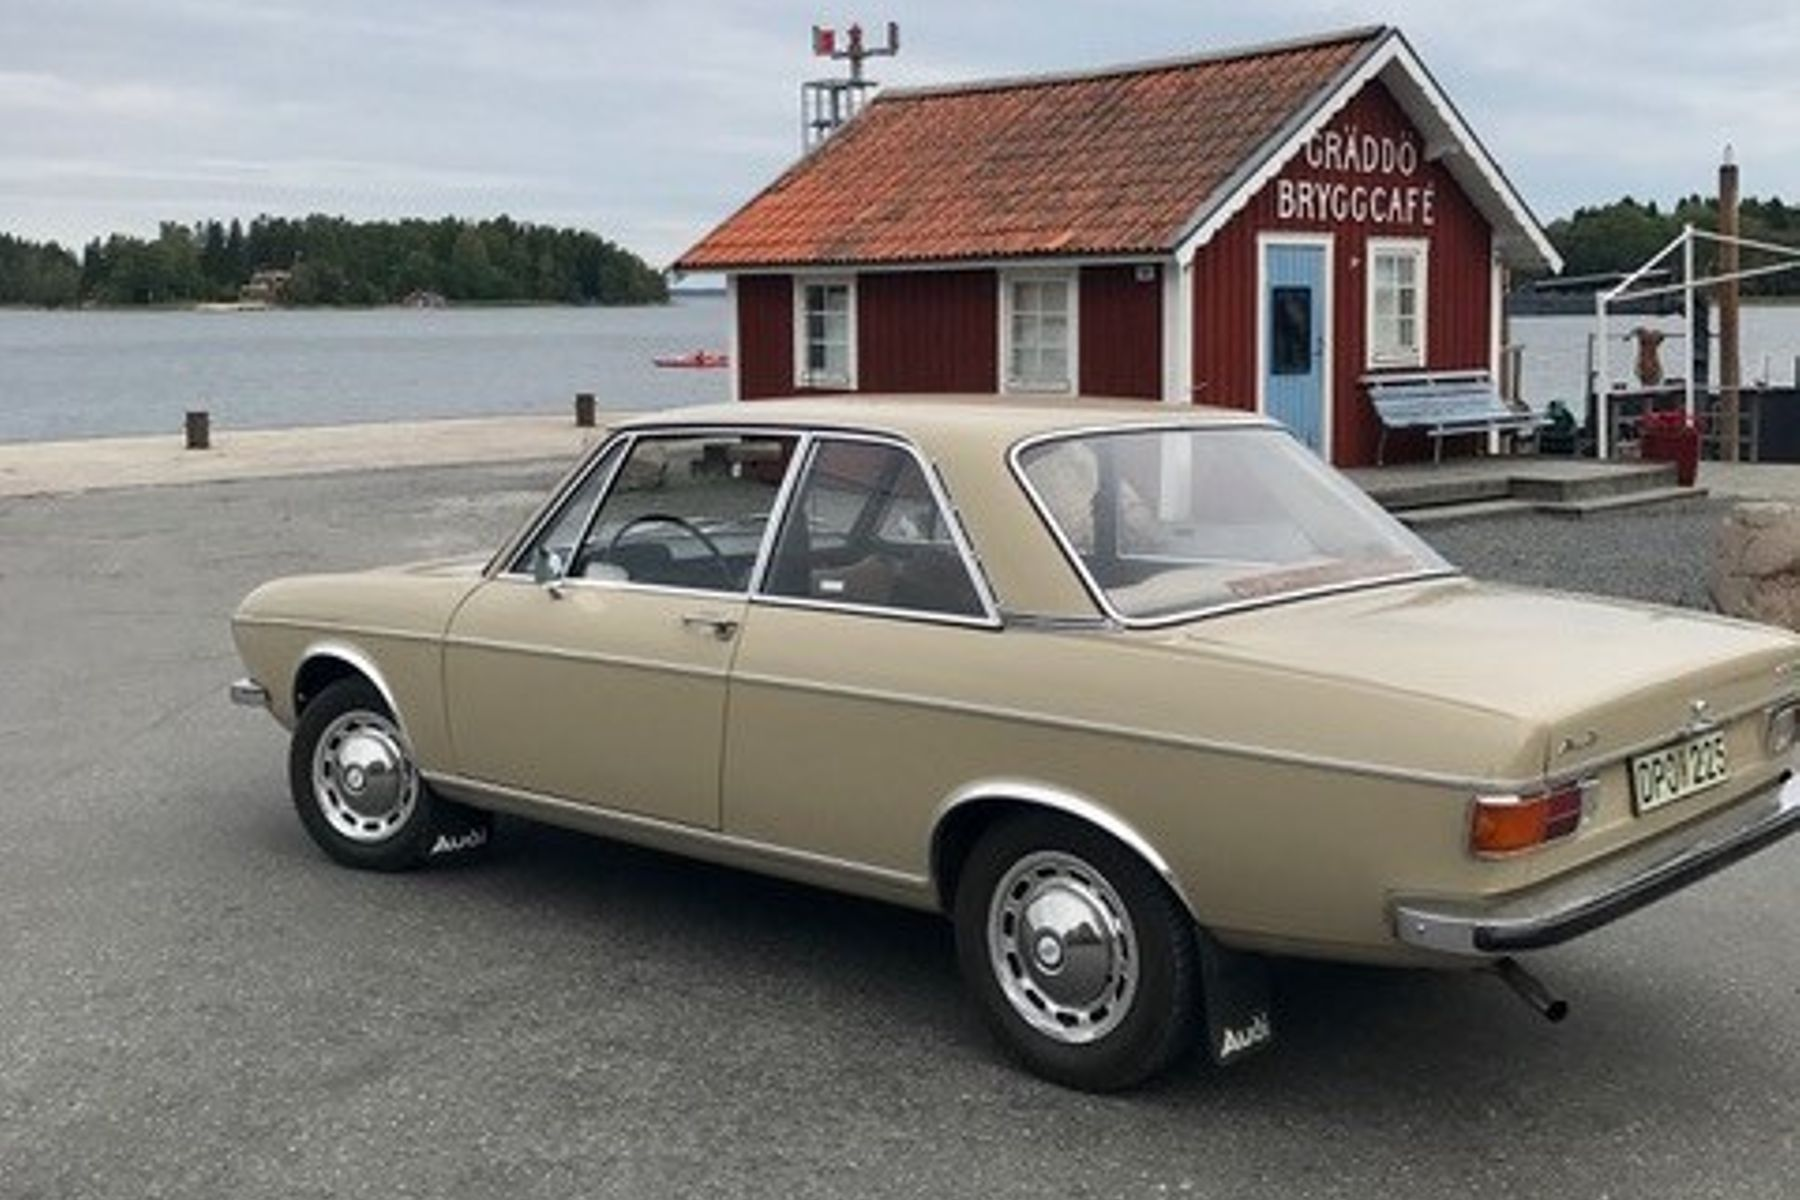 Audi 100 LS 2-dr — 1970 på Bilweb Auctions